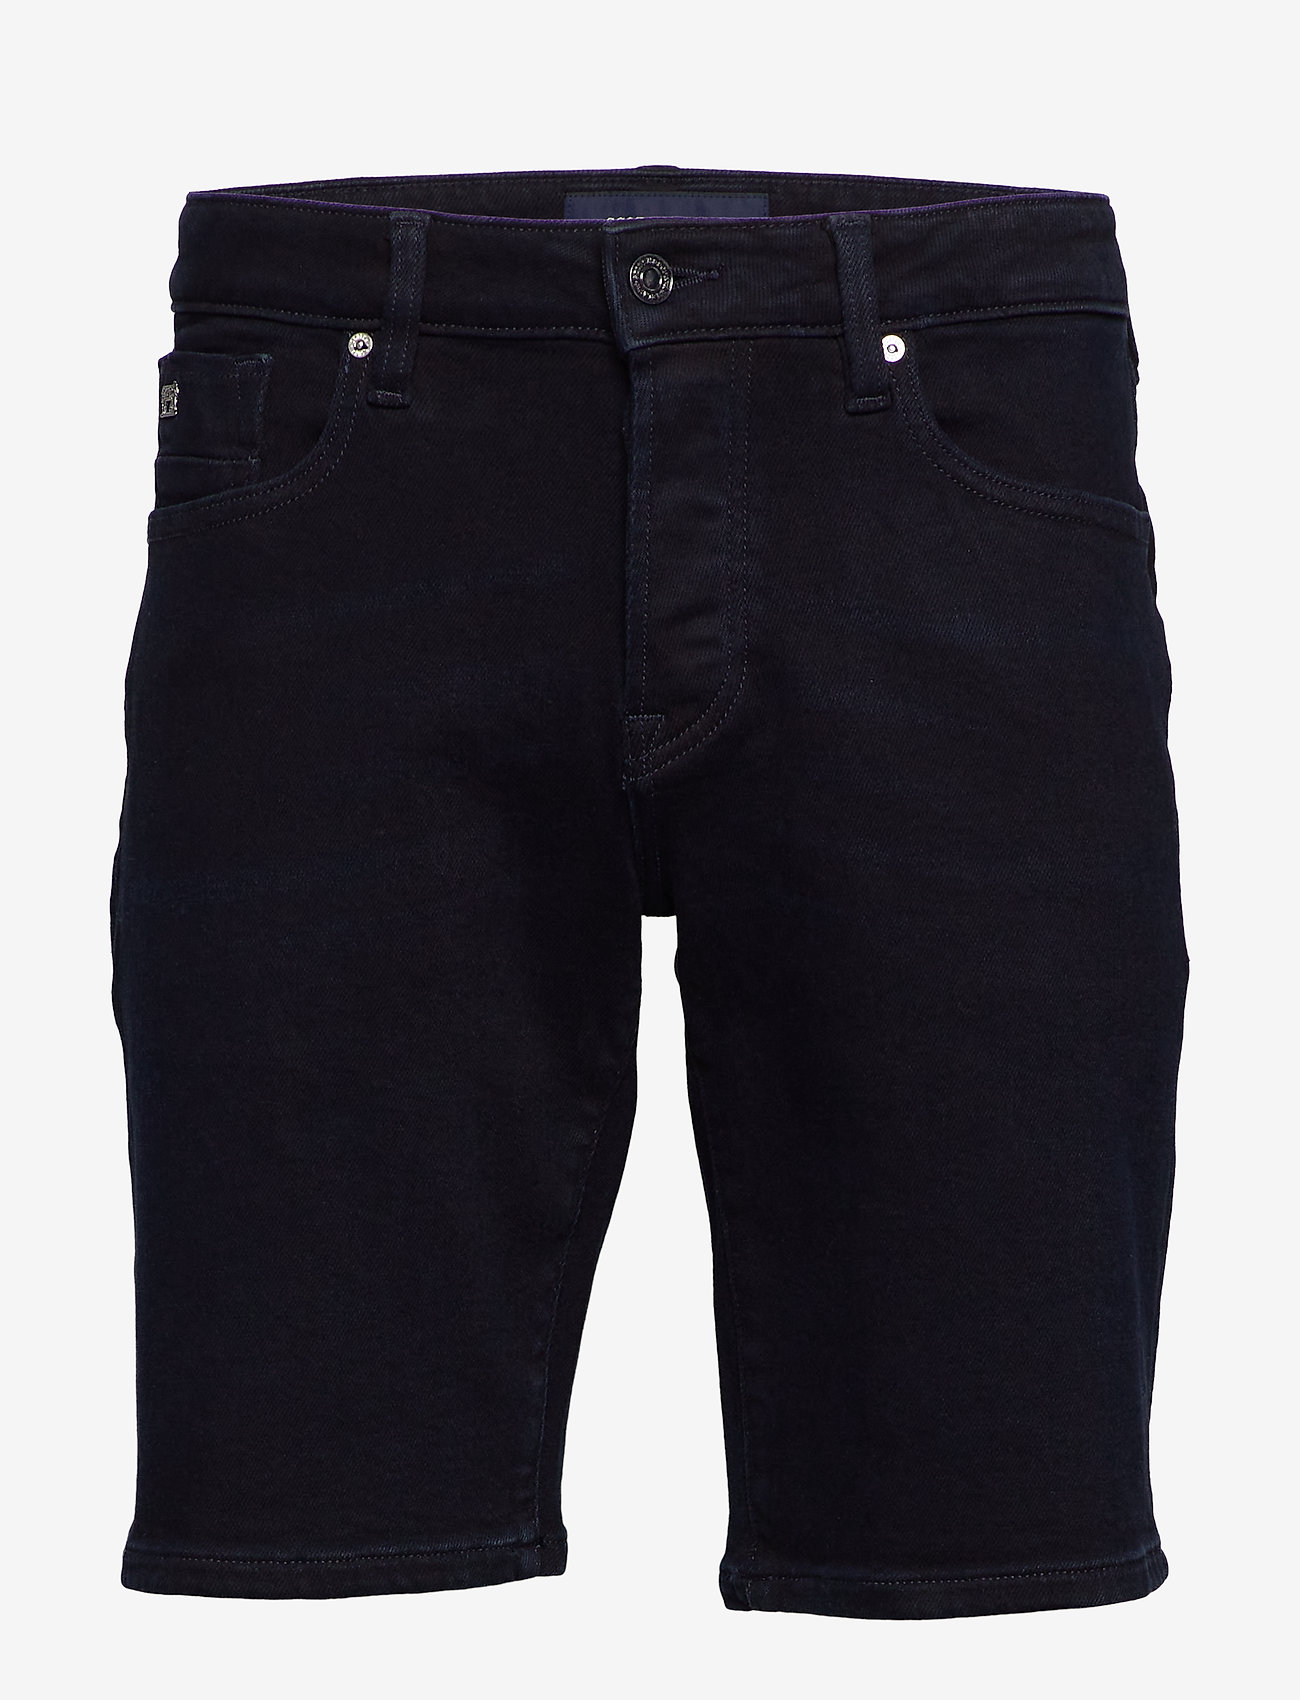 Scotch & Soda - Ralston Short - Autumn Mood - jeans shorts - autumn mood - 0